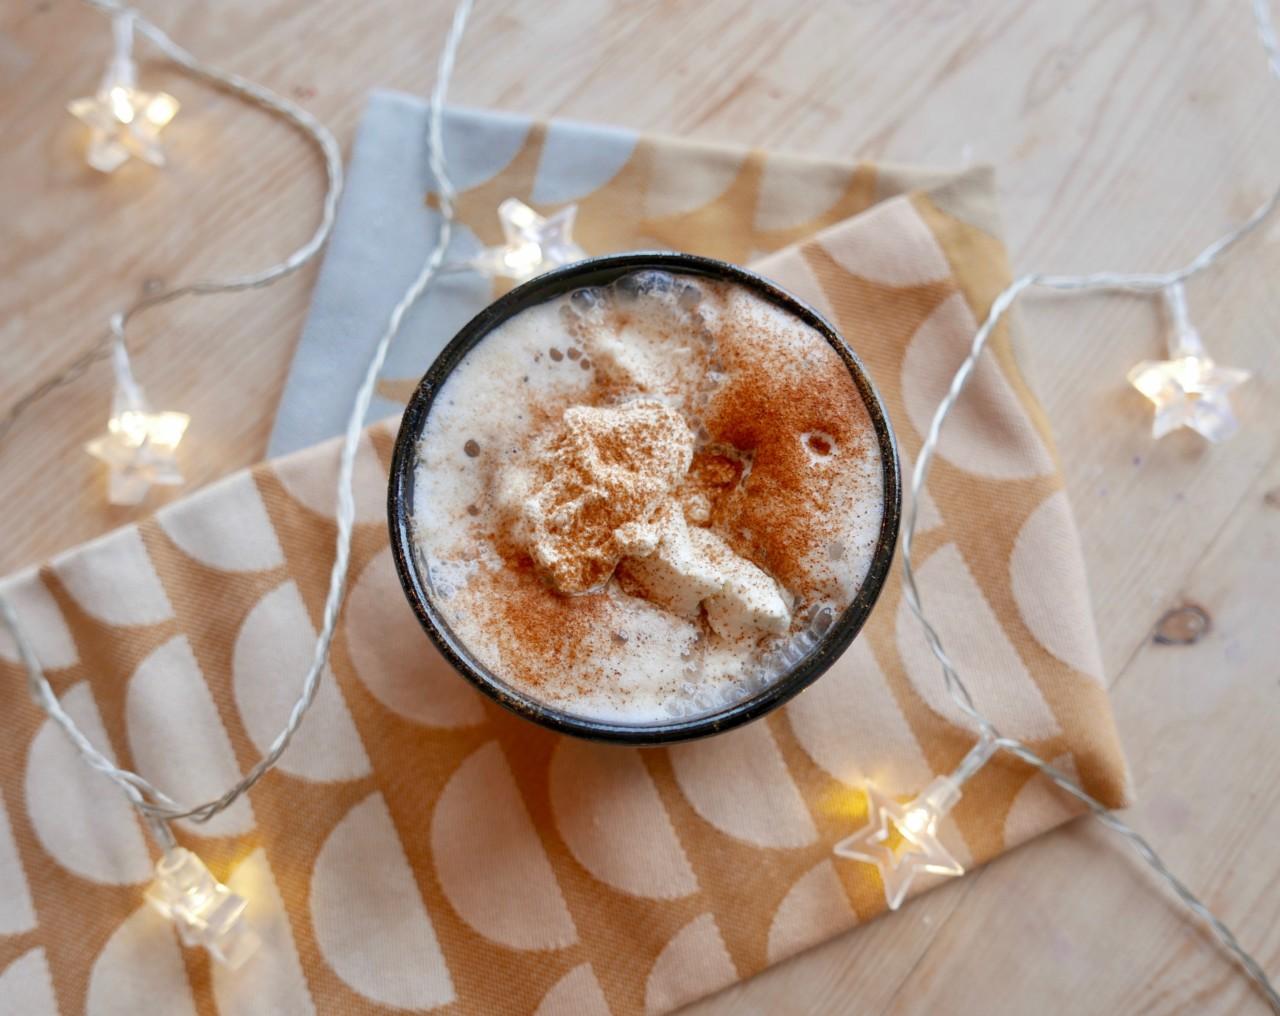 jule-latte-green-world-okologisk-kaffe-annonse-green-house